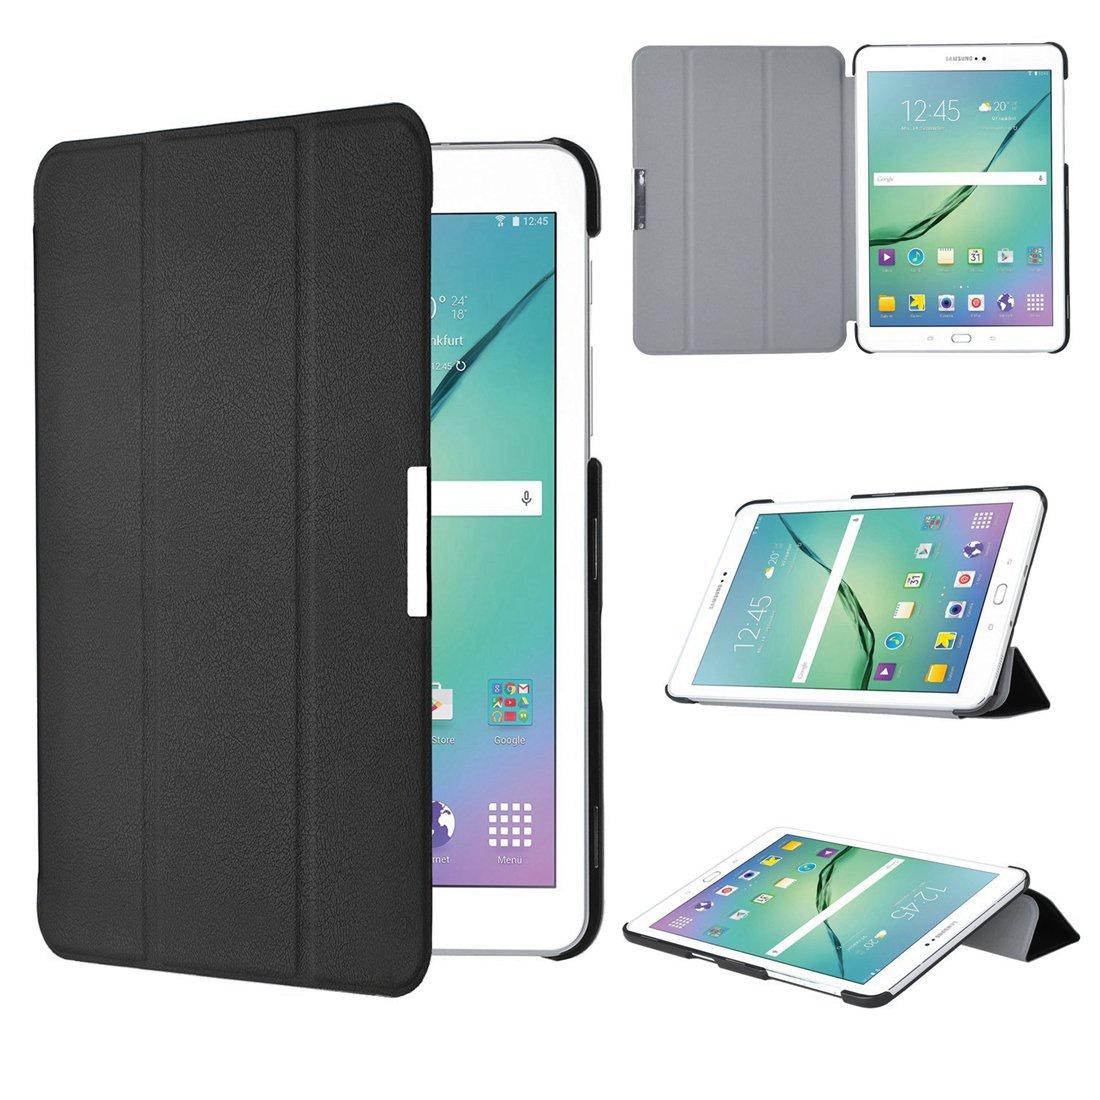 Рождество для Samsung Galaxy Tab S2 8-дюймовый корпус - тонкий смарт-чехол для Samsung Galaxy Tab S2 8-дюймовый планшет (черный)